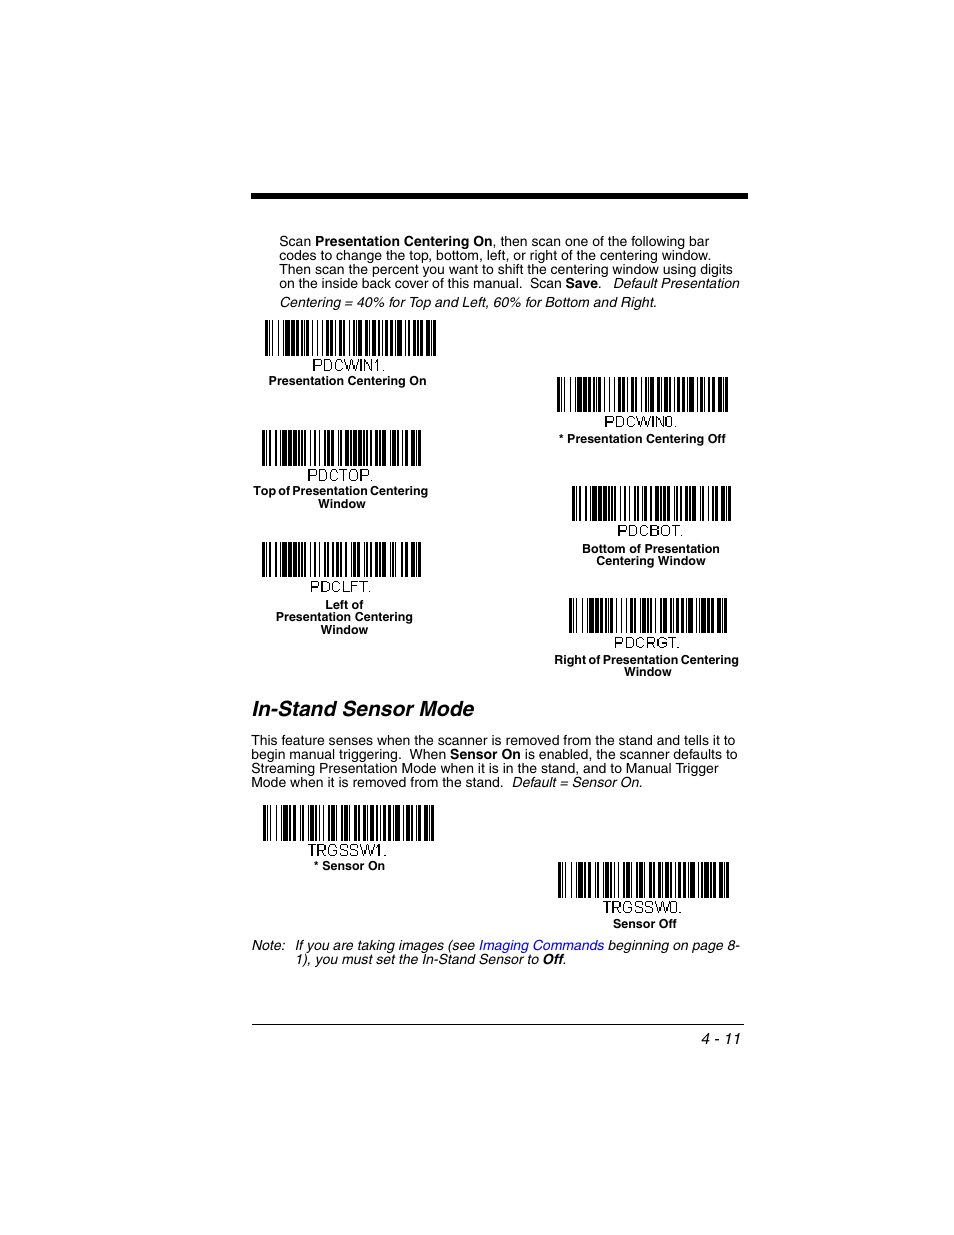 In-stand sensor mode, In-stand sensor mode -11 | Honeywell